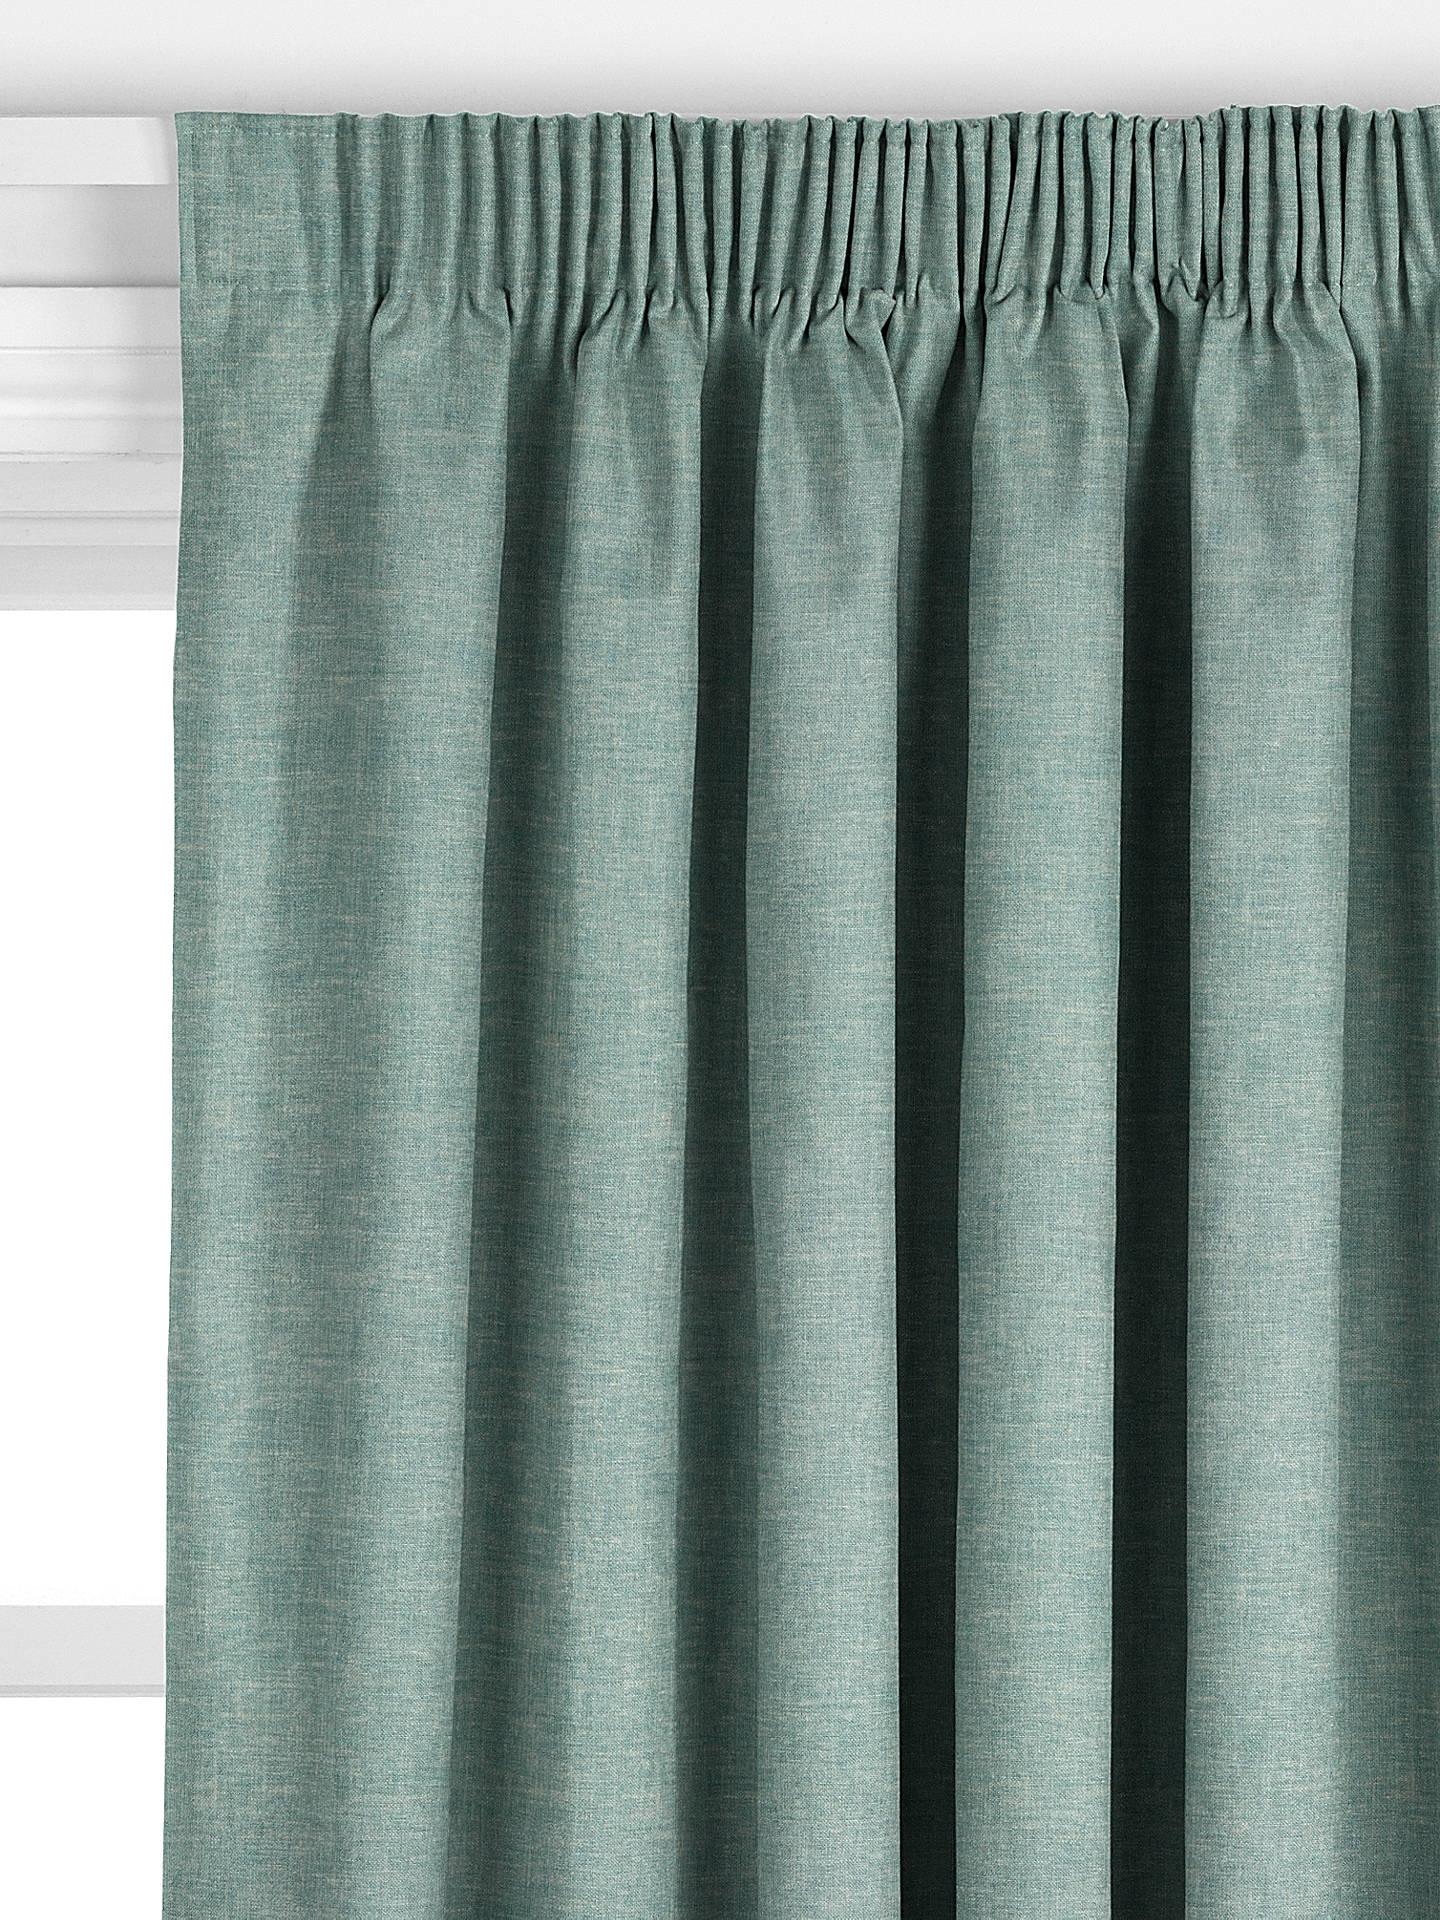 5f1f35de8268 John Lewis   Partners Cotton Blend Made to Measure Curtains ...